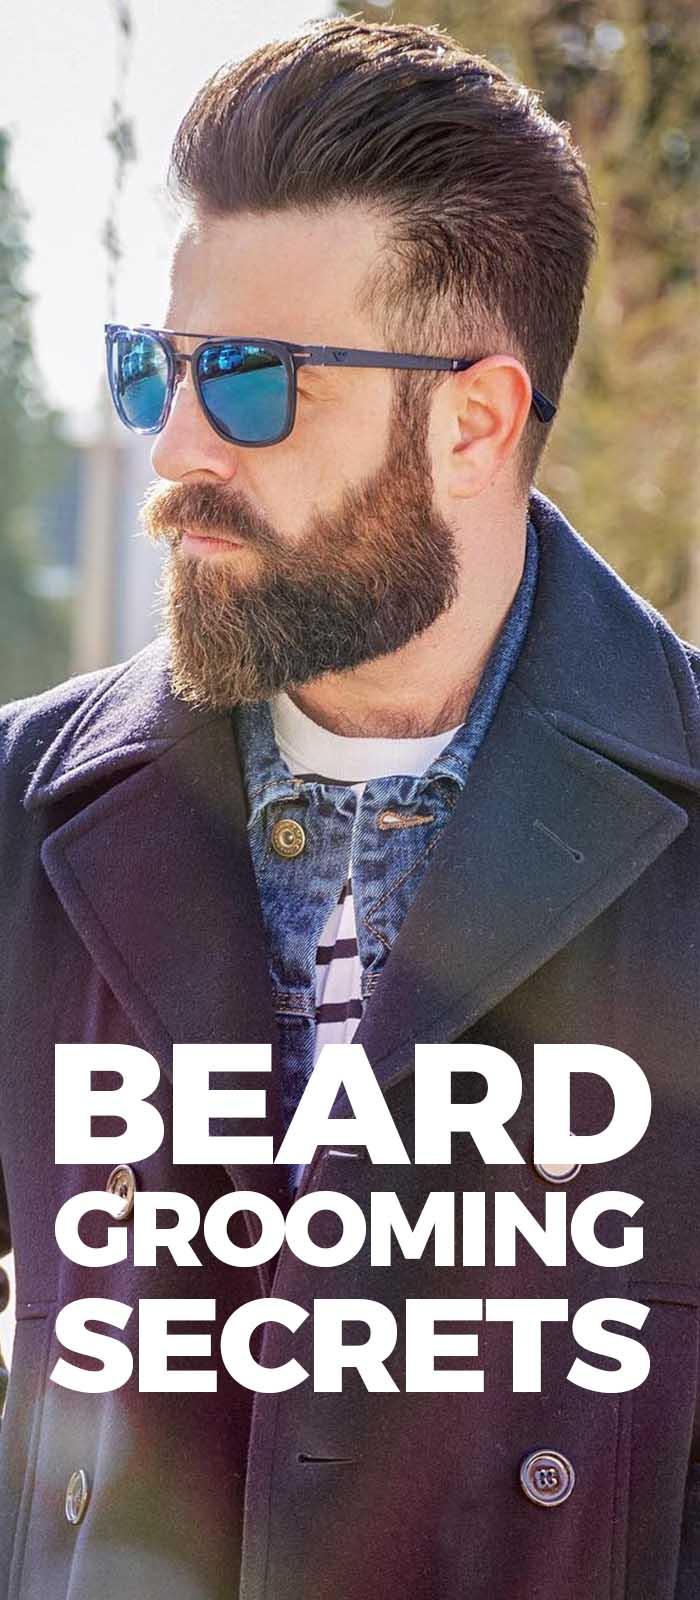 Beard Grooming Secrets